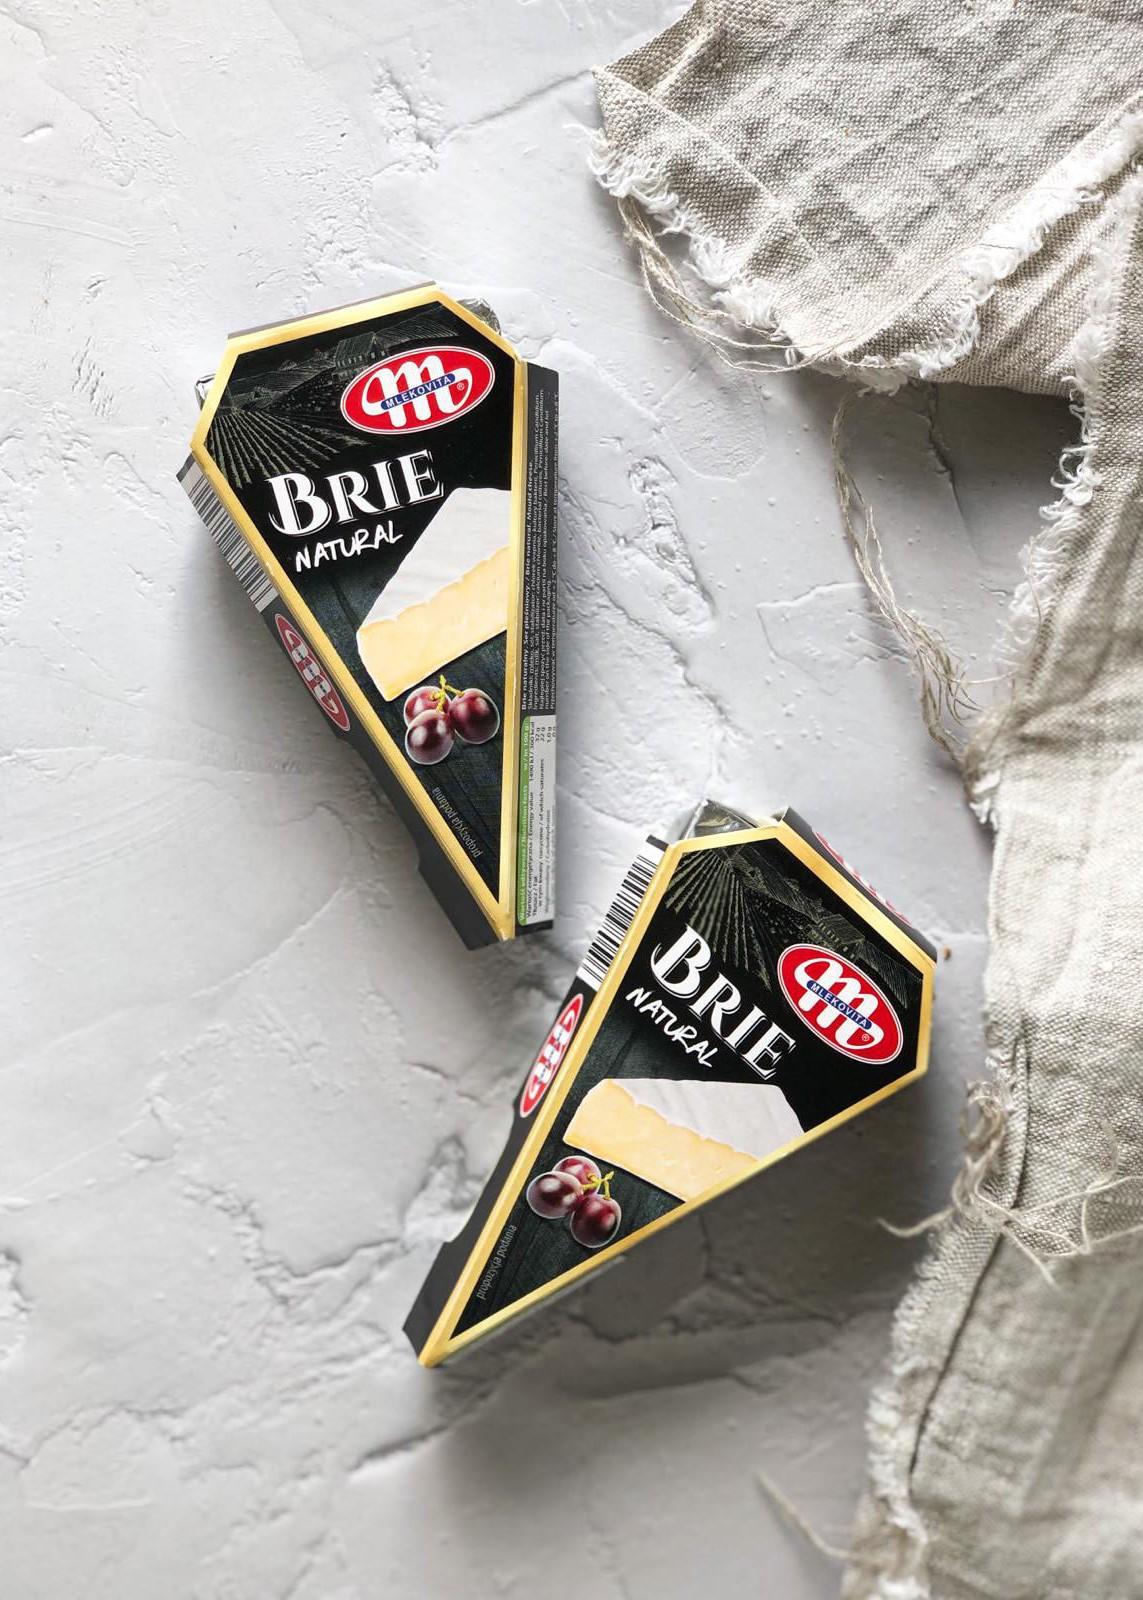 Сыр мягкий с плесенью, Brie Natural